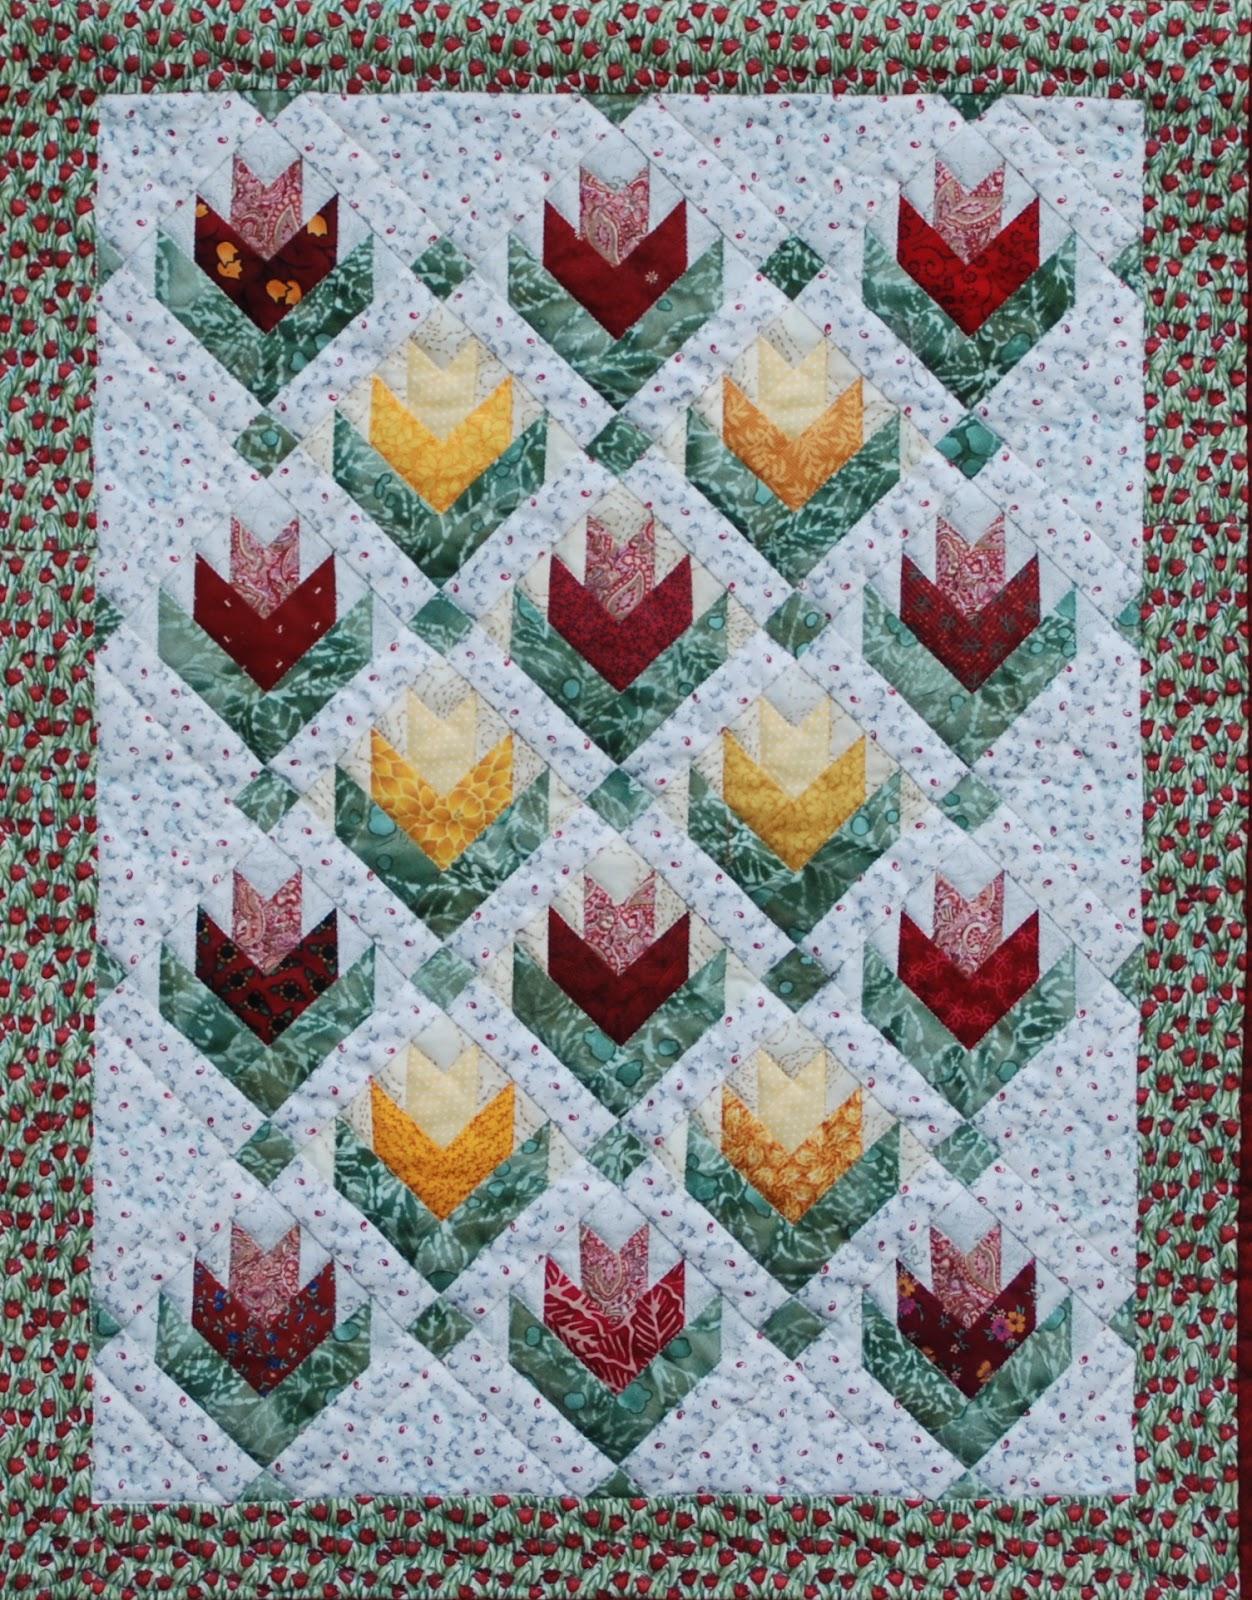 Mbw quilts en andere stofzaken - Quilts gele ...